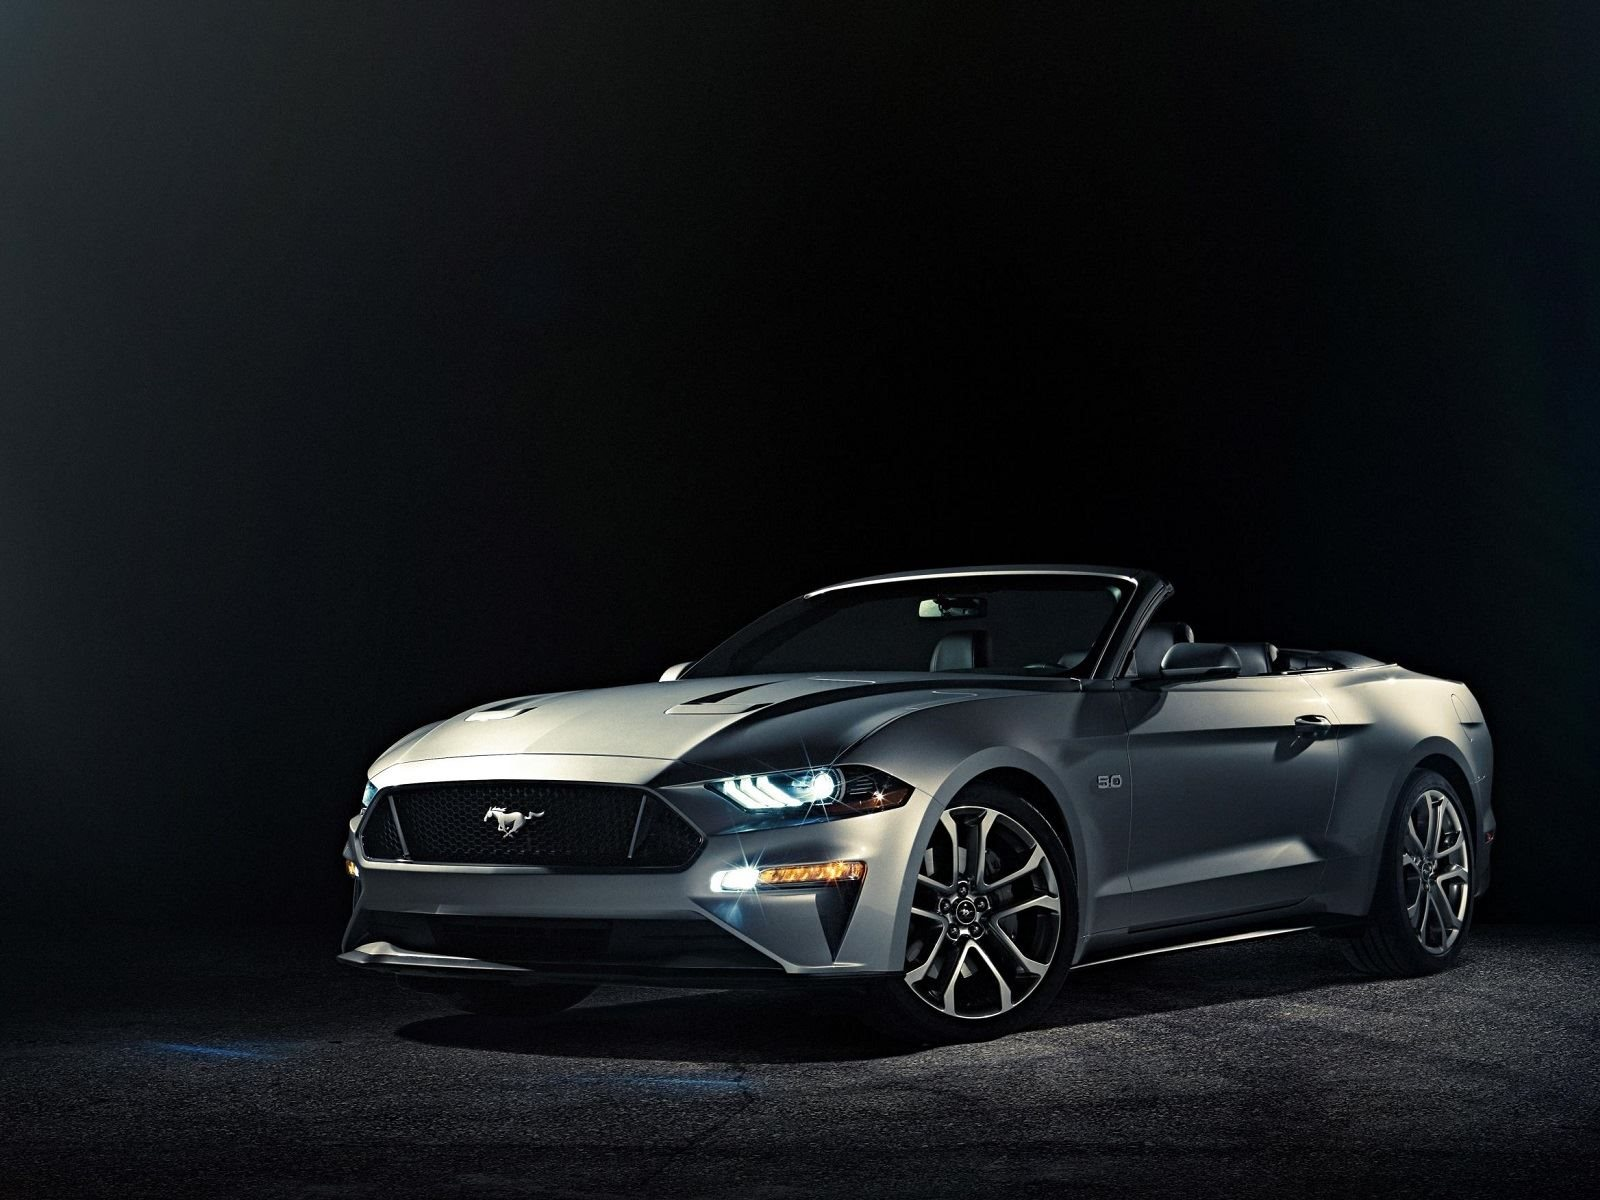 2018-ford-mustang-gt-premium-convertible.jpg